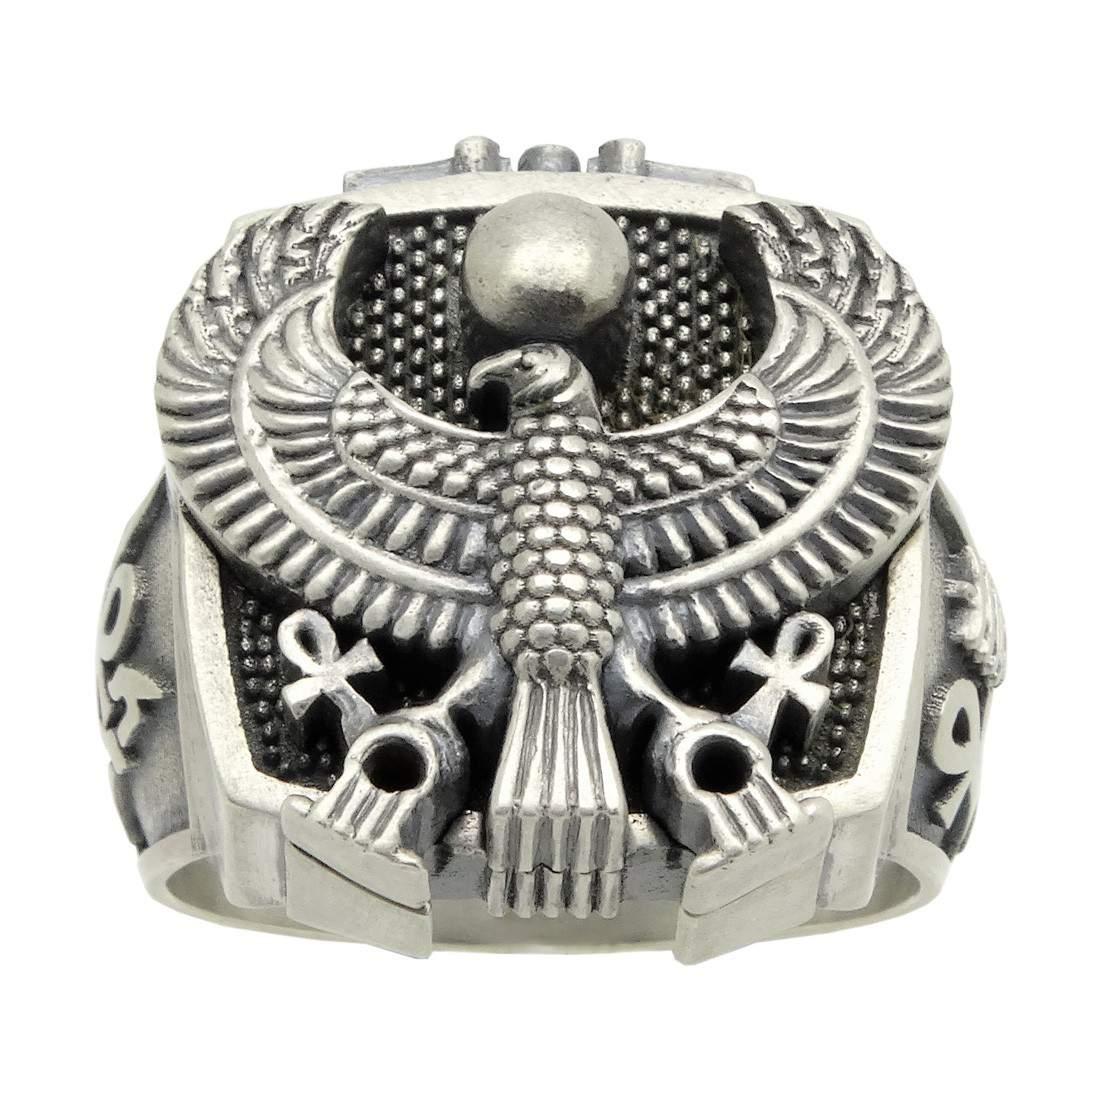 Secretium Rings 925 Silver Ring Egyptian Jewelry